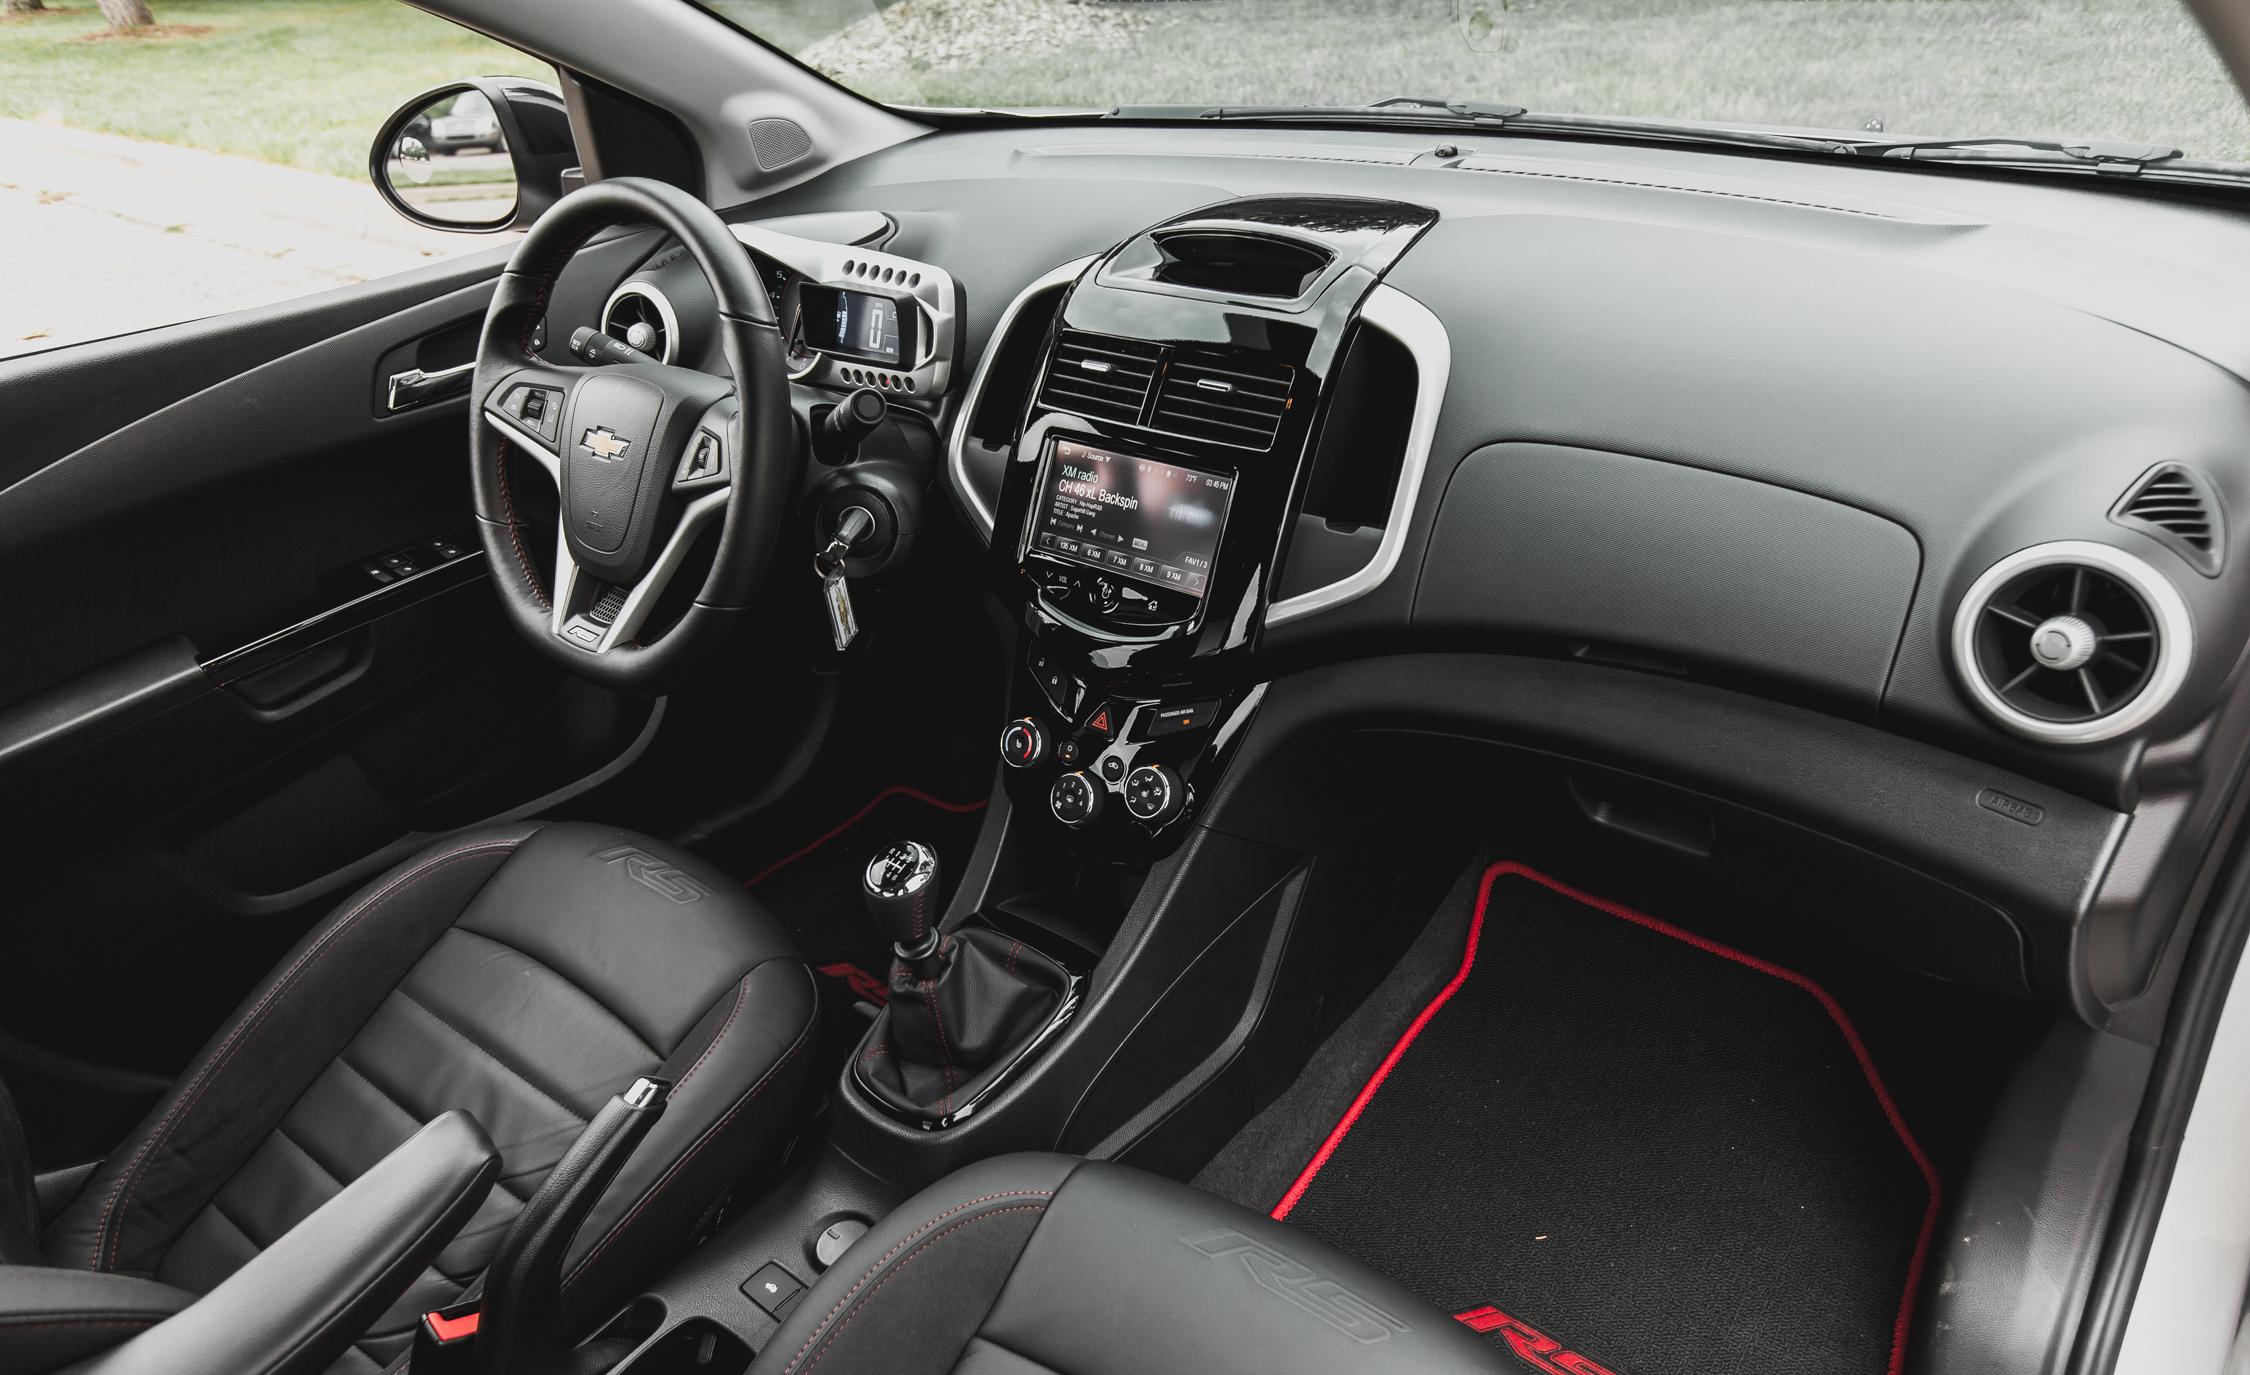 2014 Chevrolet Sonic Rs Sedan Interior Gallery Photo 12 Of 27